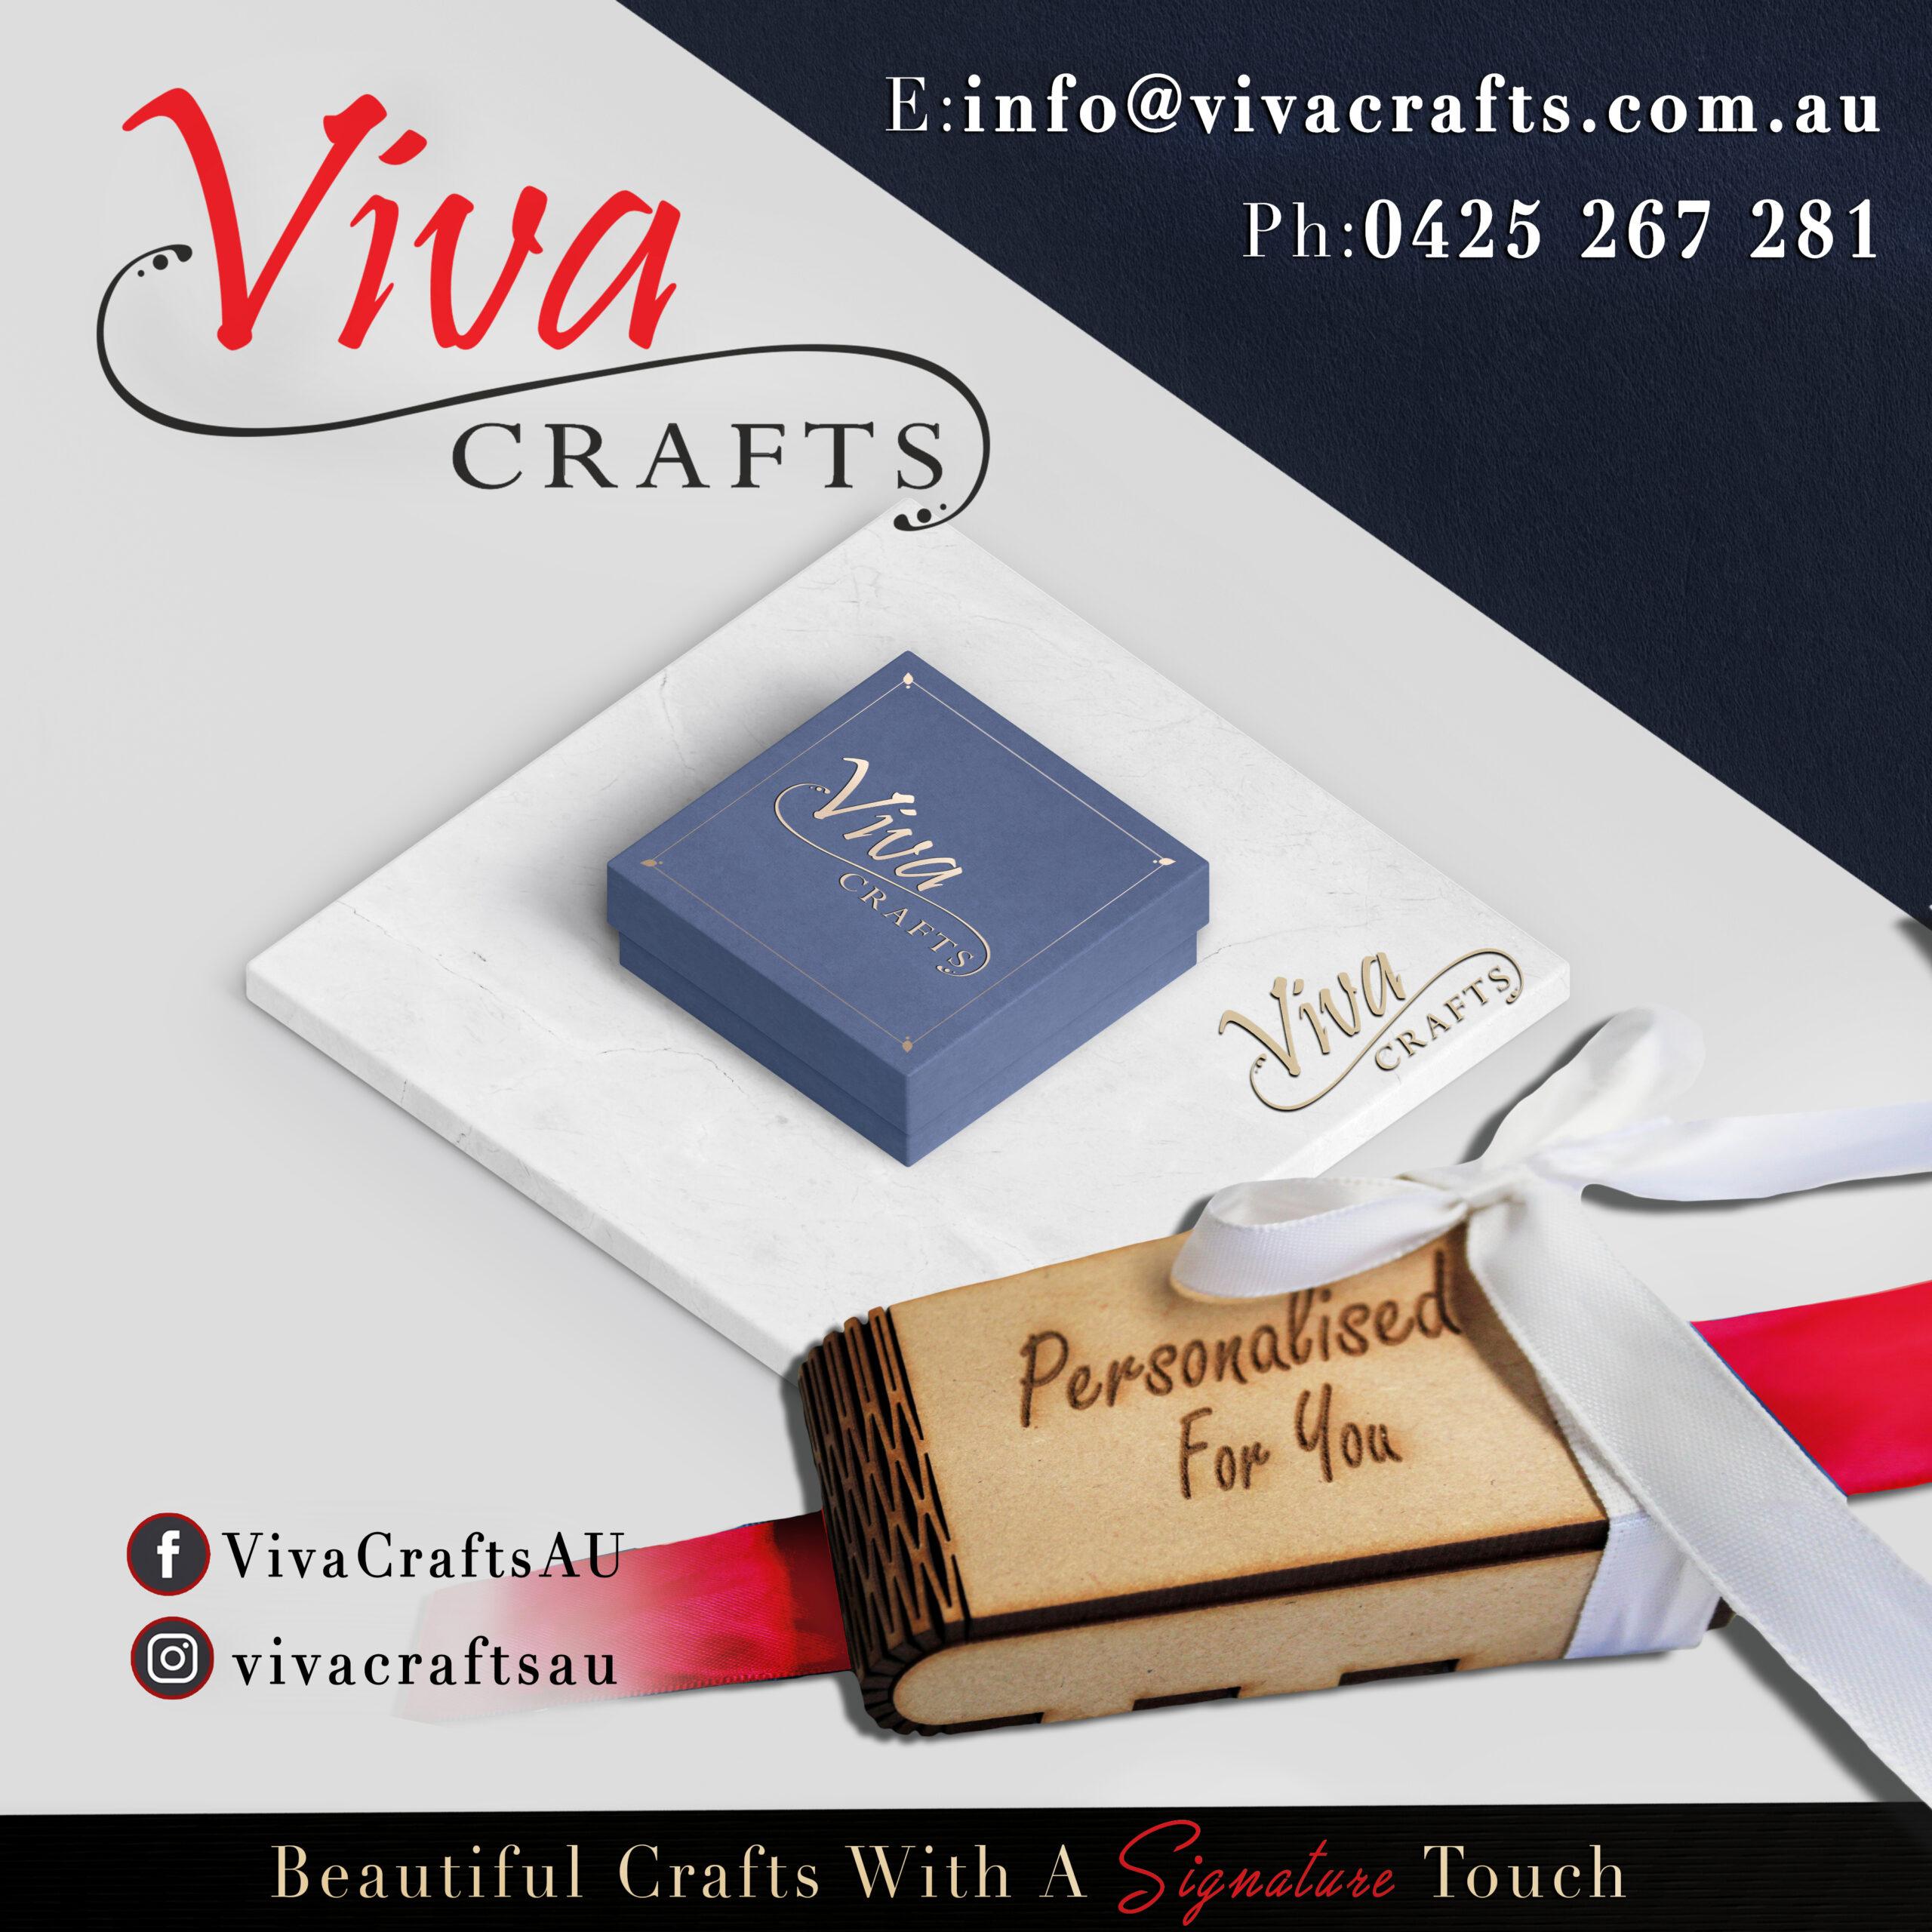 viva-crafts-mockup-design